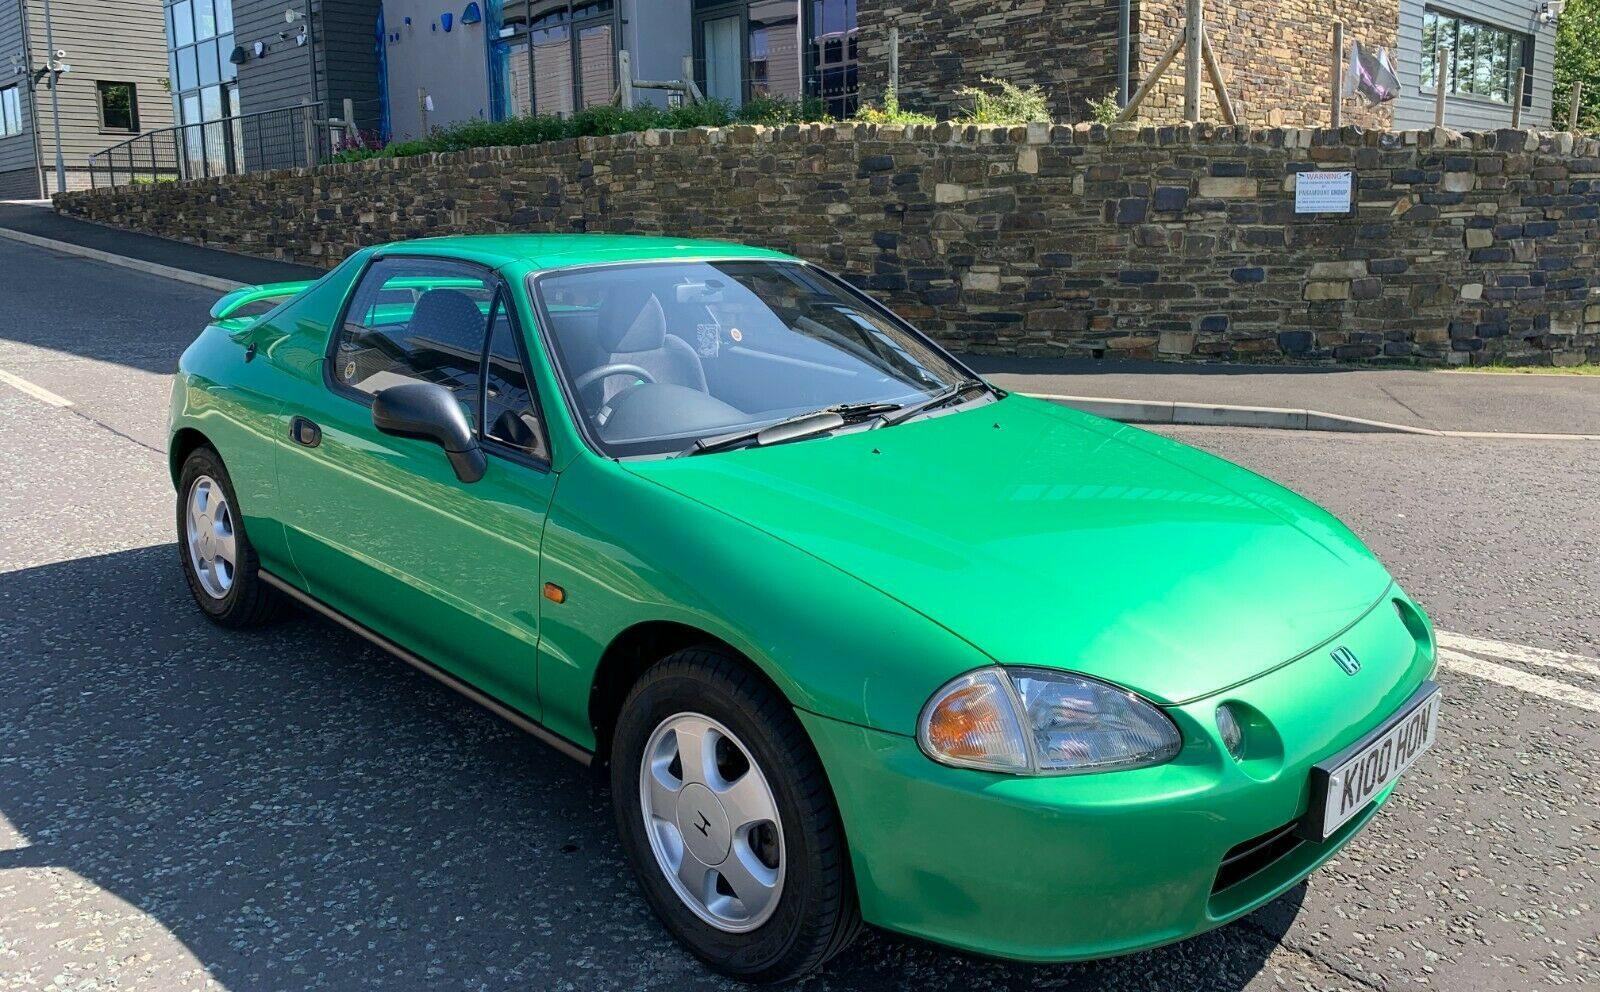 This samba green Honda CRX is the holy grail of weird Hondas